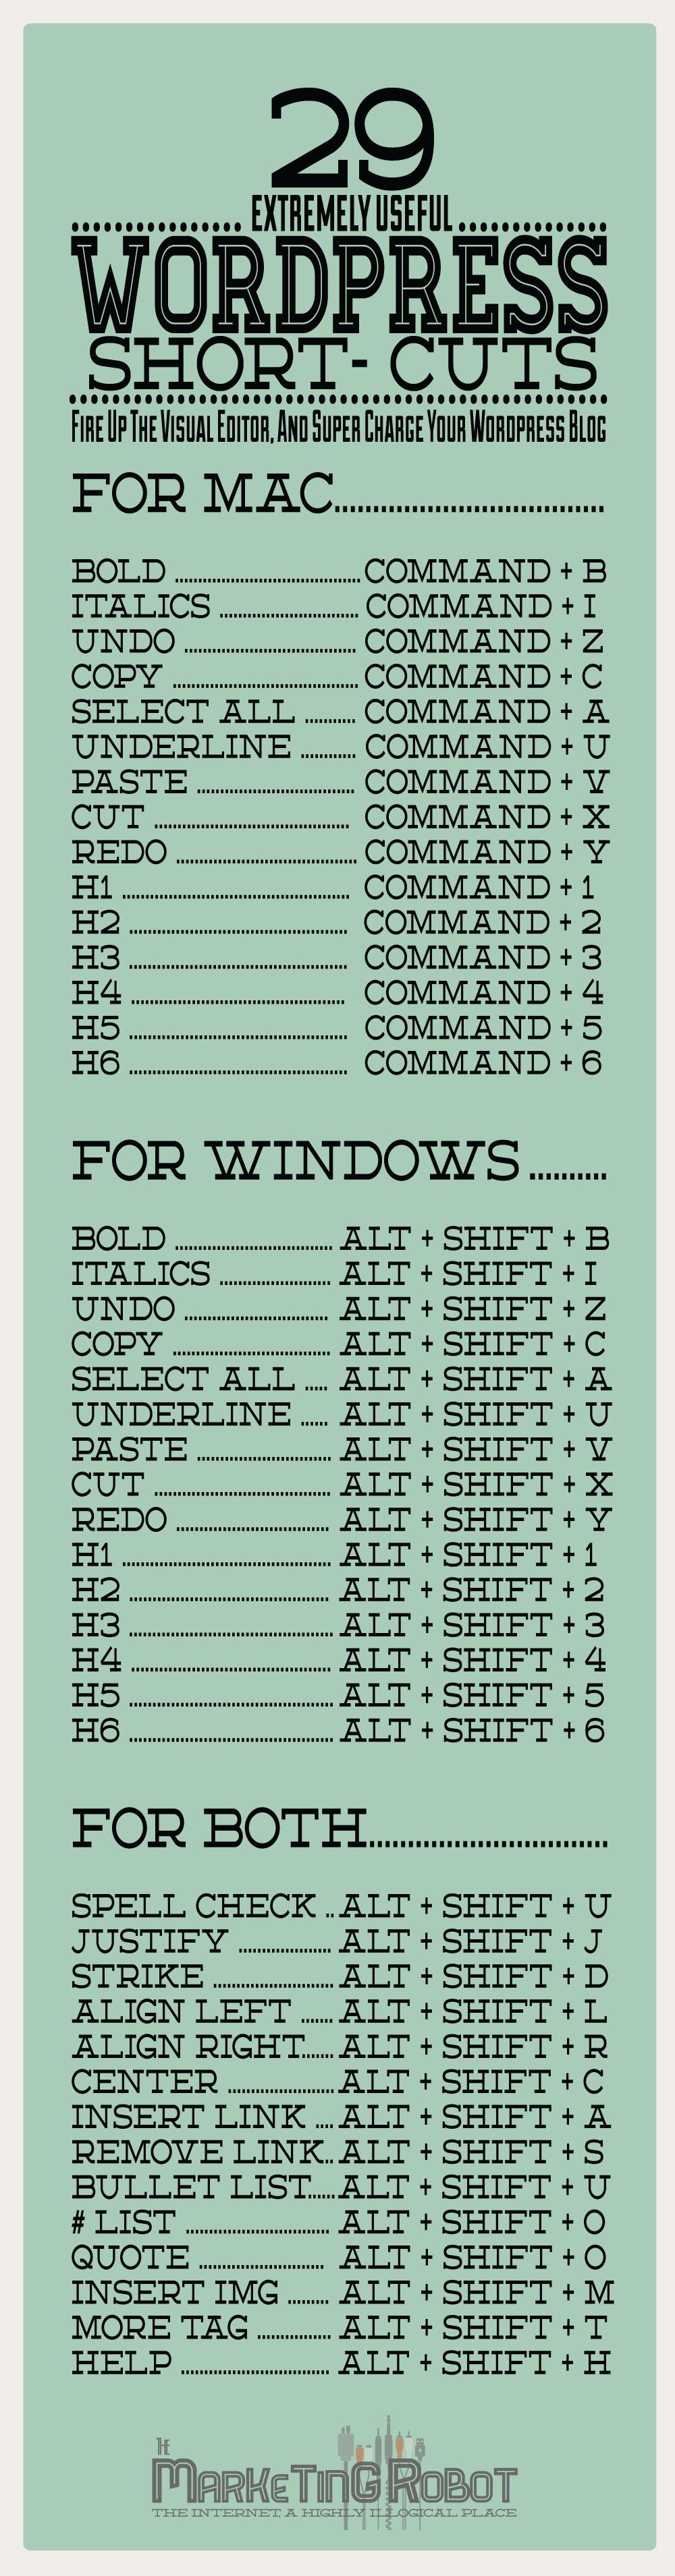 useful-wordpress-short-cuts